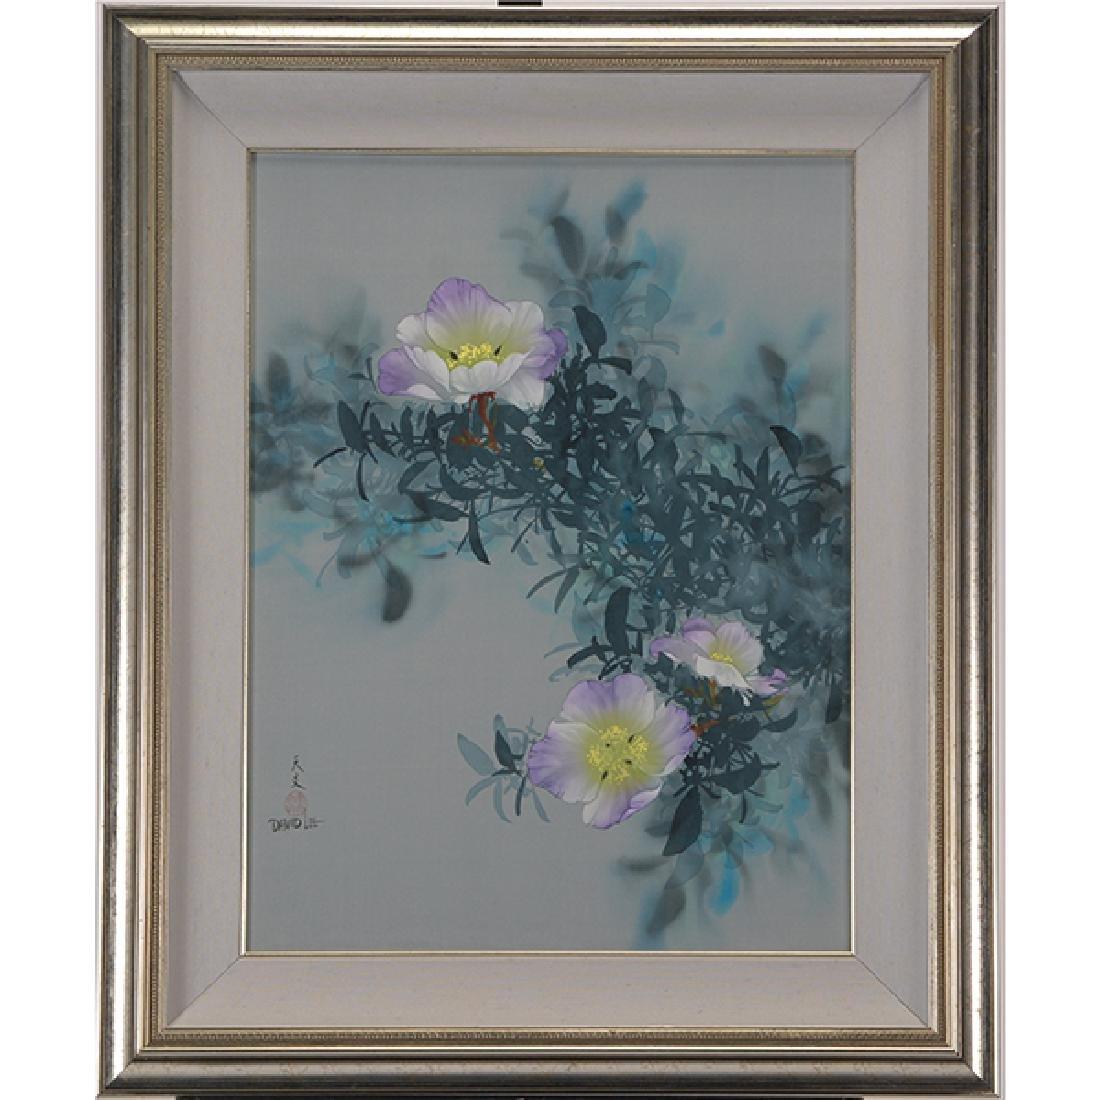 David Lee (b. 1944): Flowers